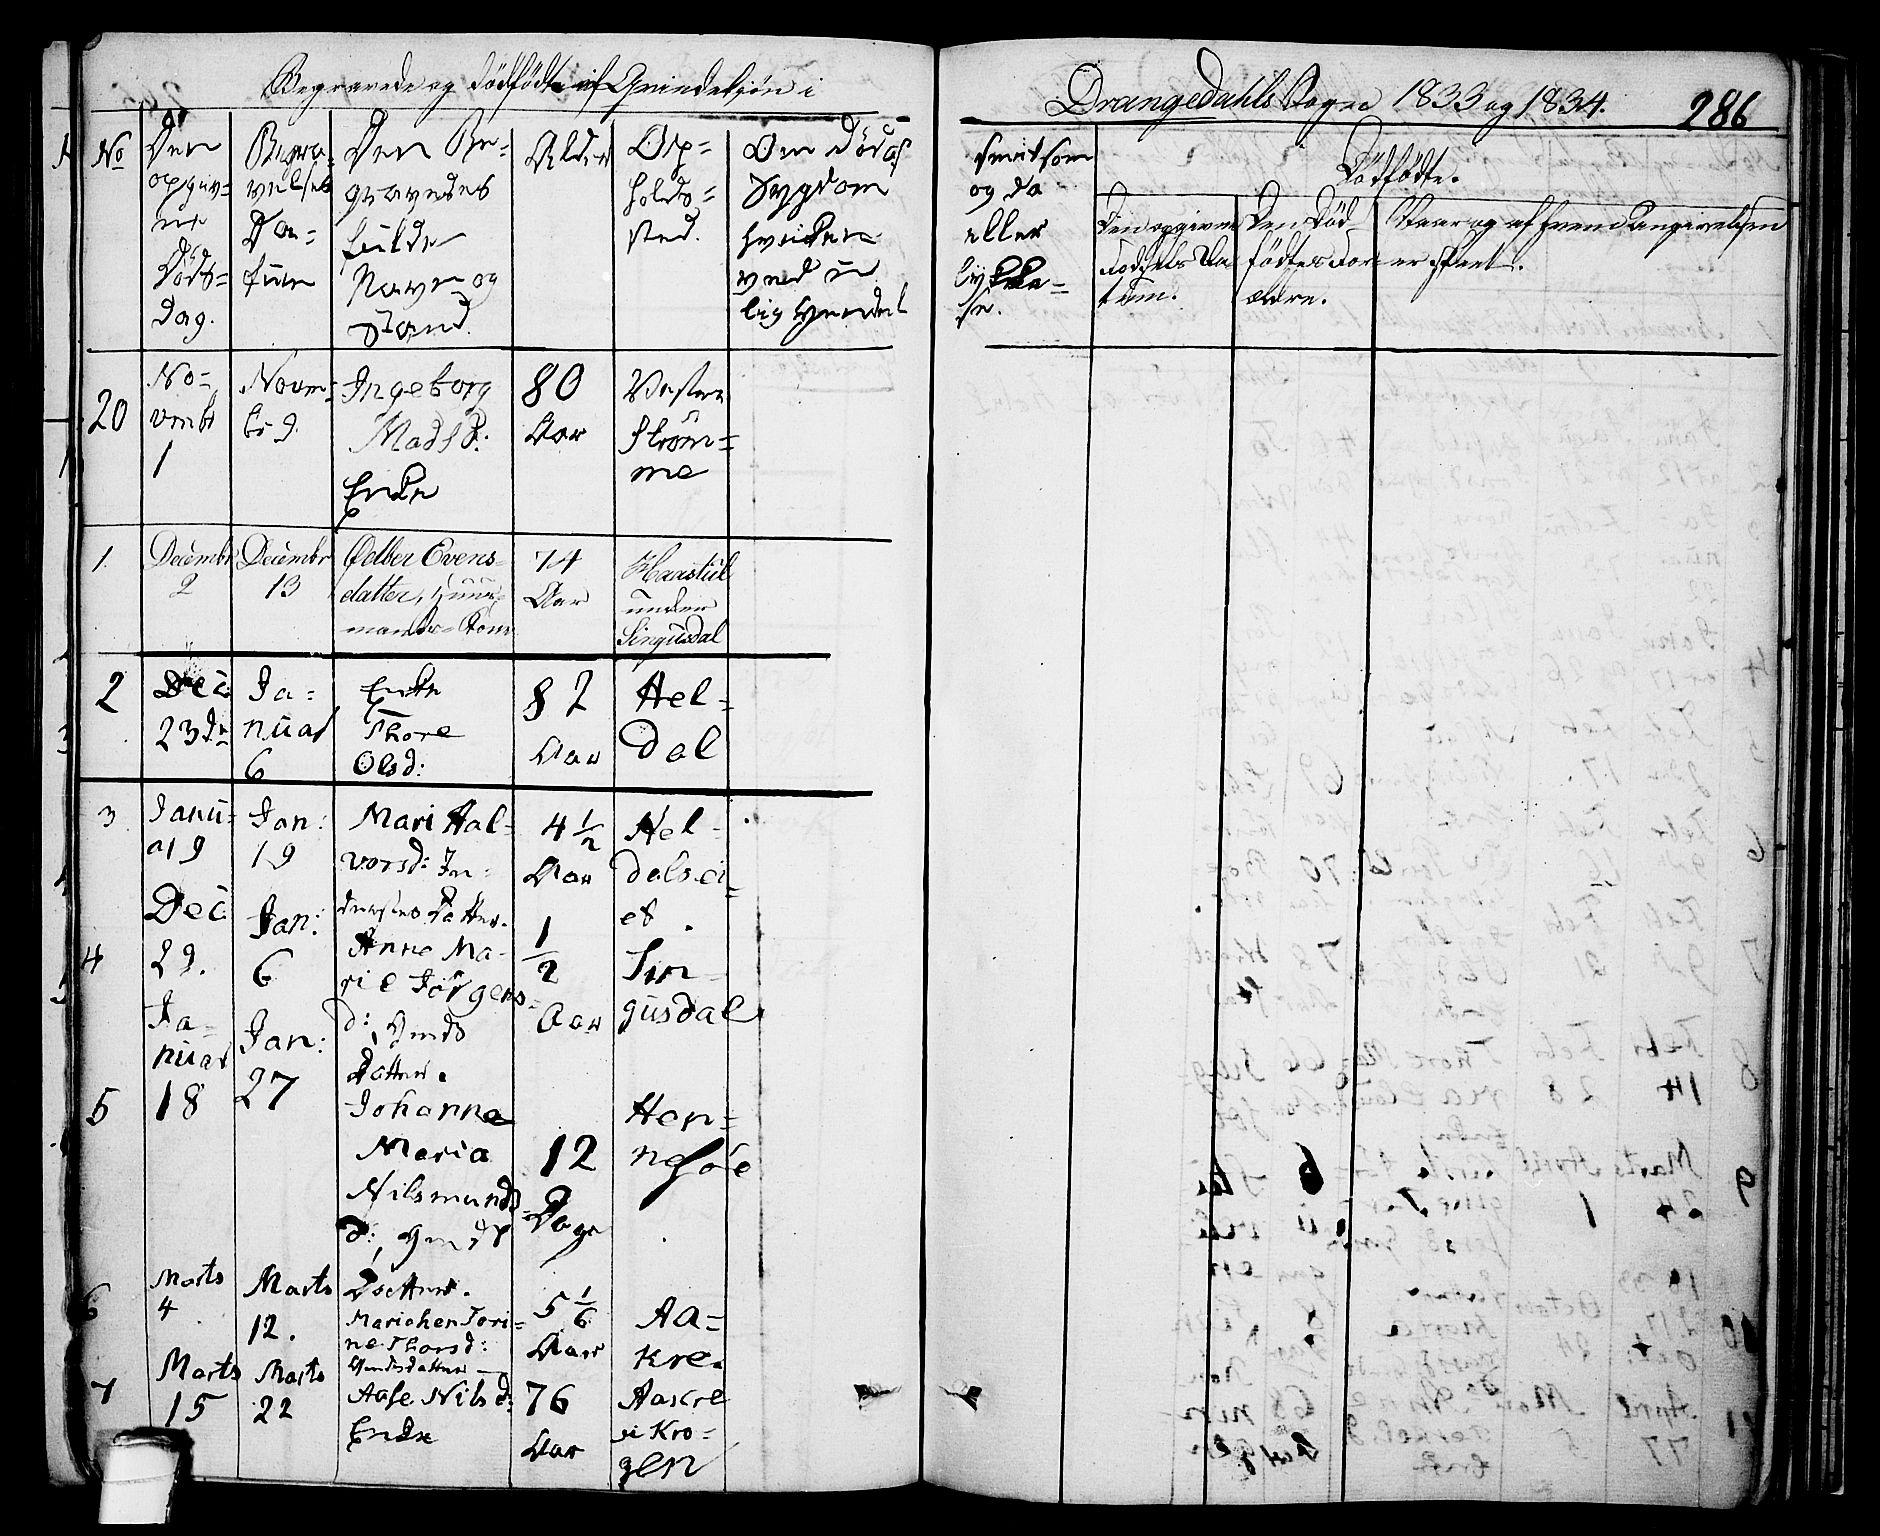 SAKO, Drangedal kirkebøker, F/Fa/L0006: Ministerialbok nr. 6, 1831-1837, s. 286